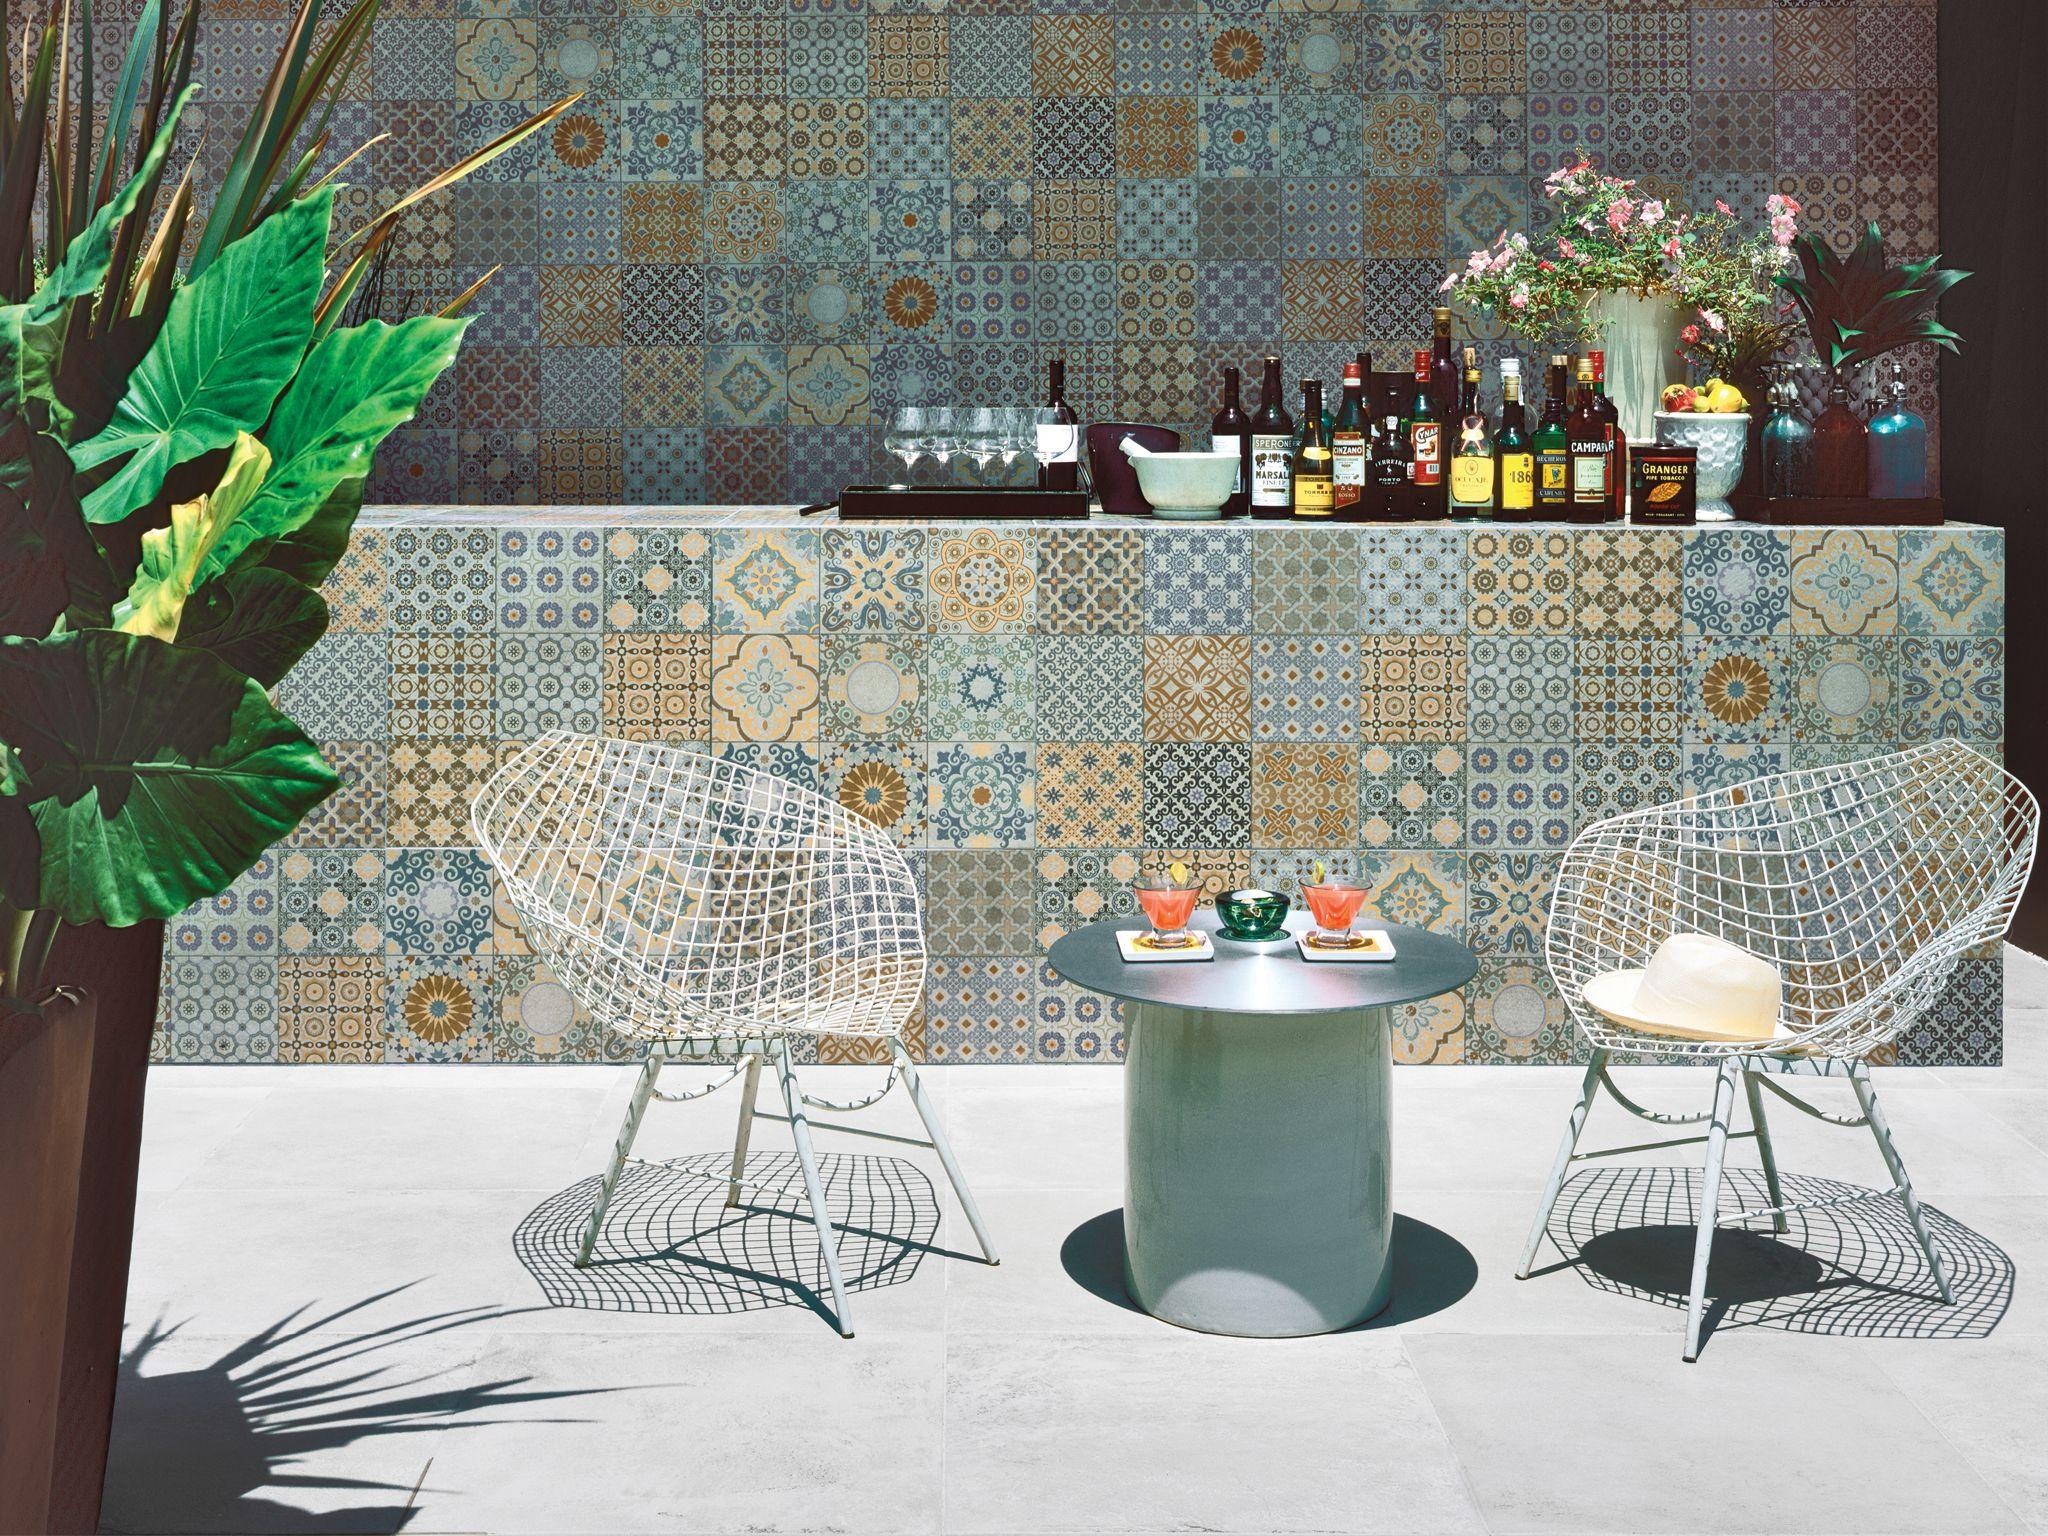 Espectaculares exteriores producto l nea murcia de for Azulejos para patios exteriores